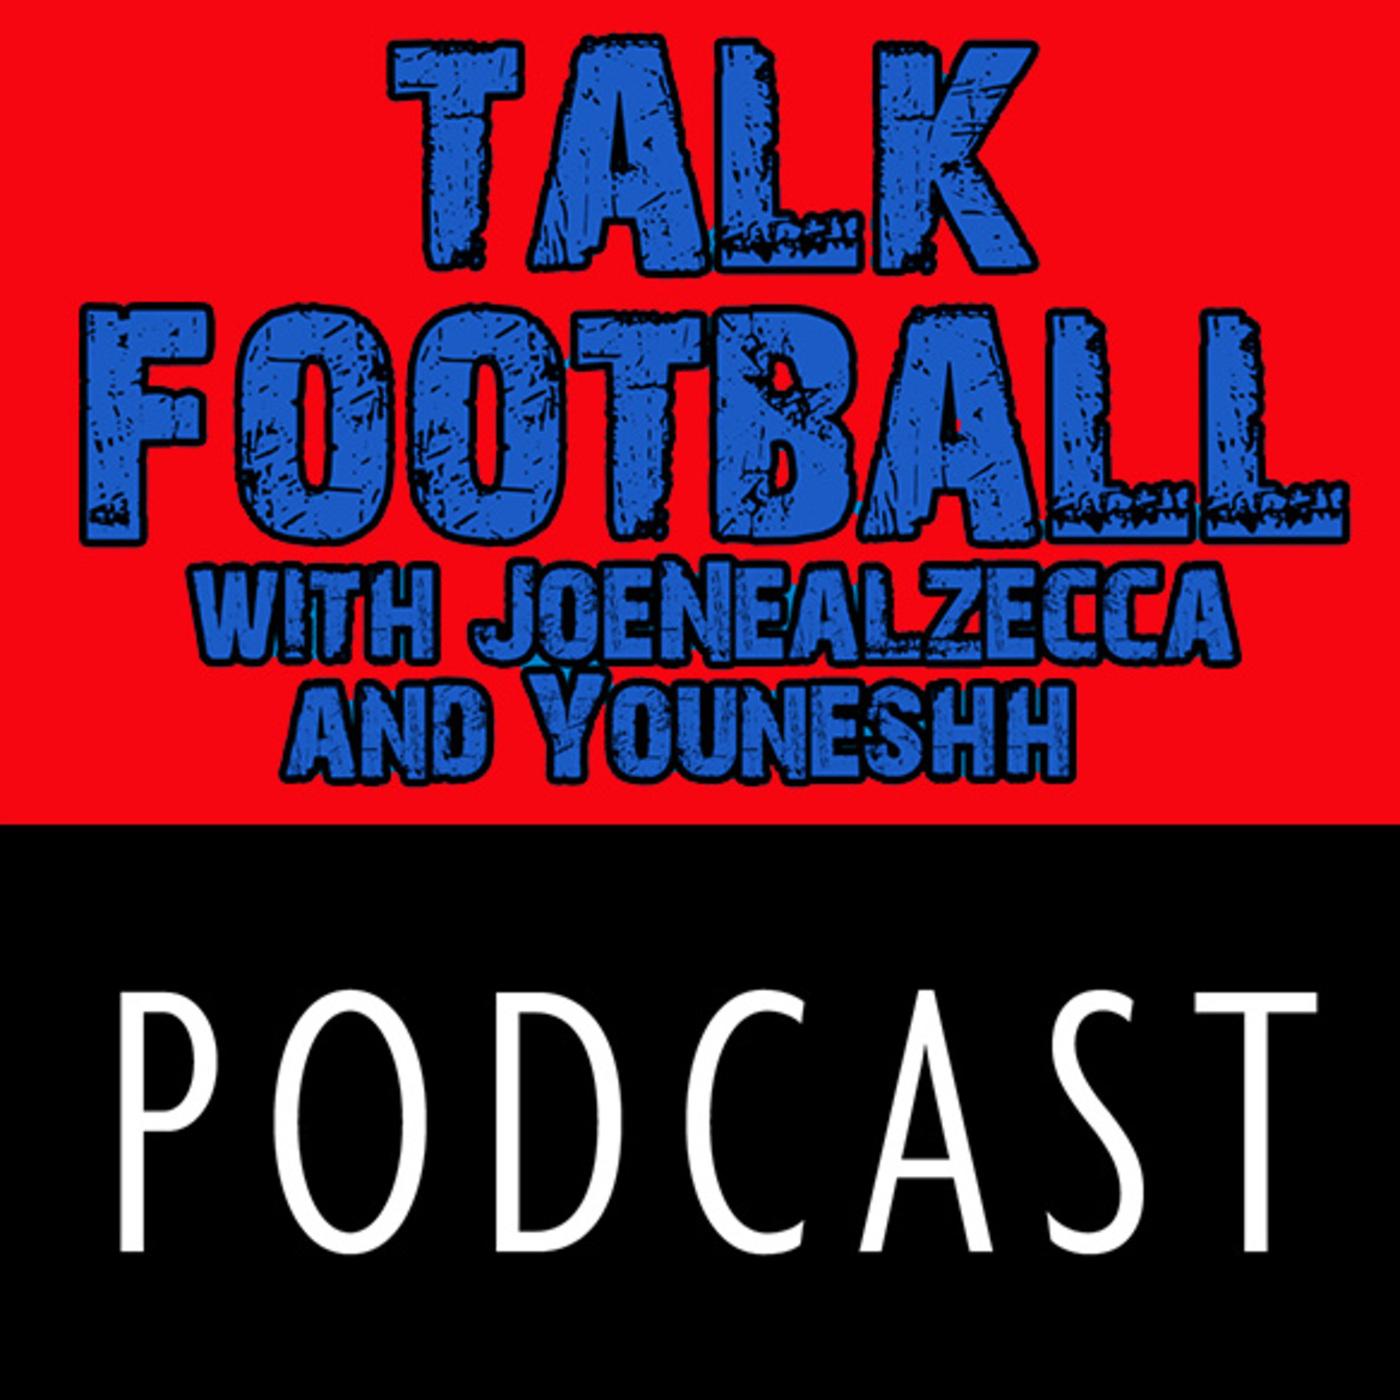 Joe Neal Zecca's Podcast